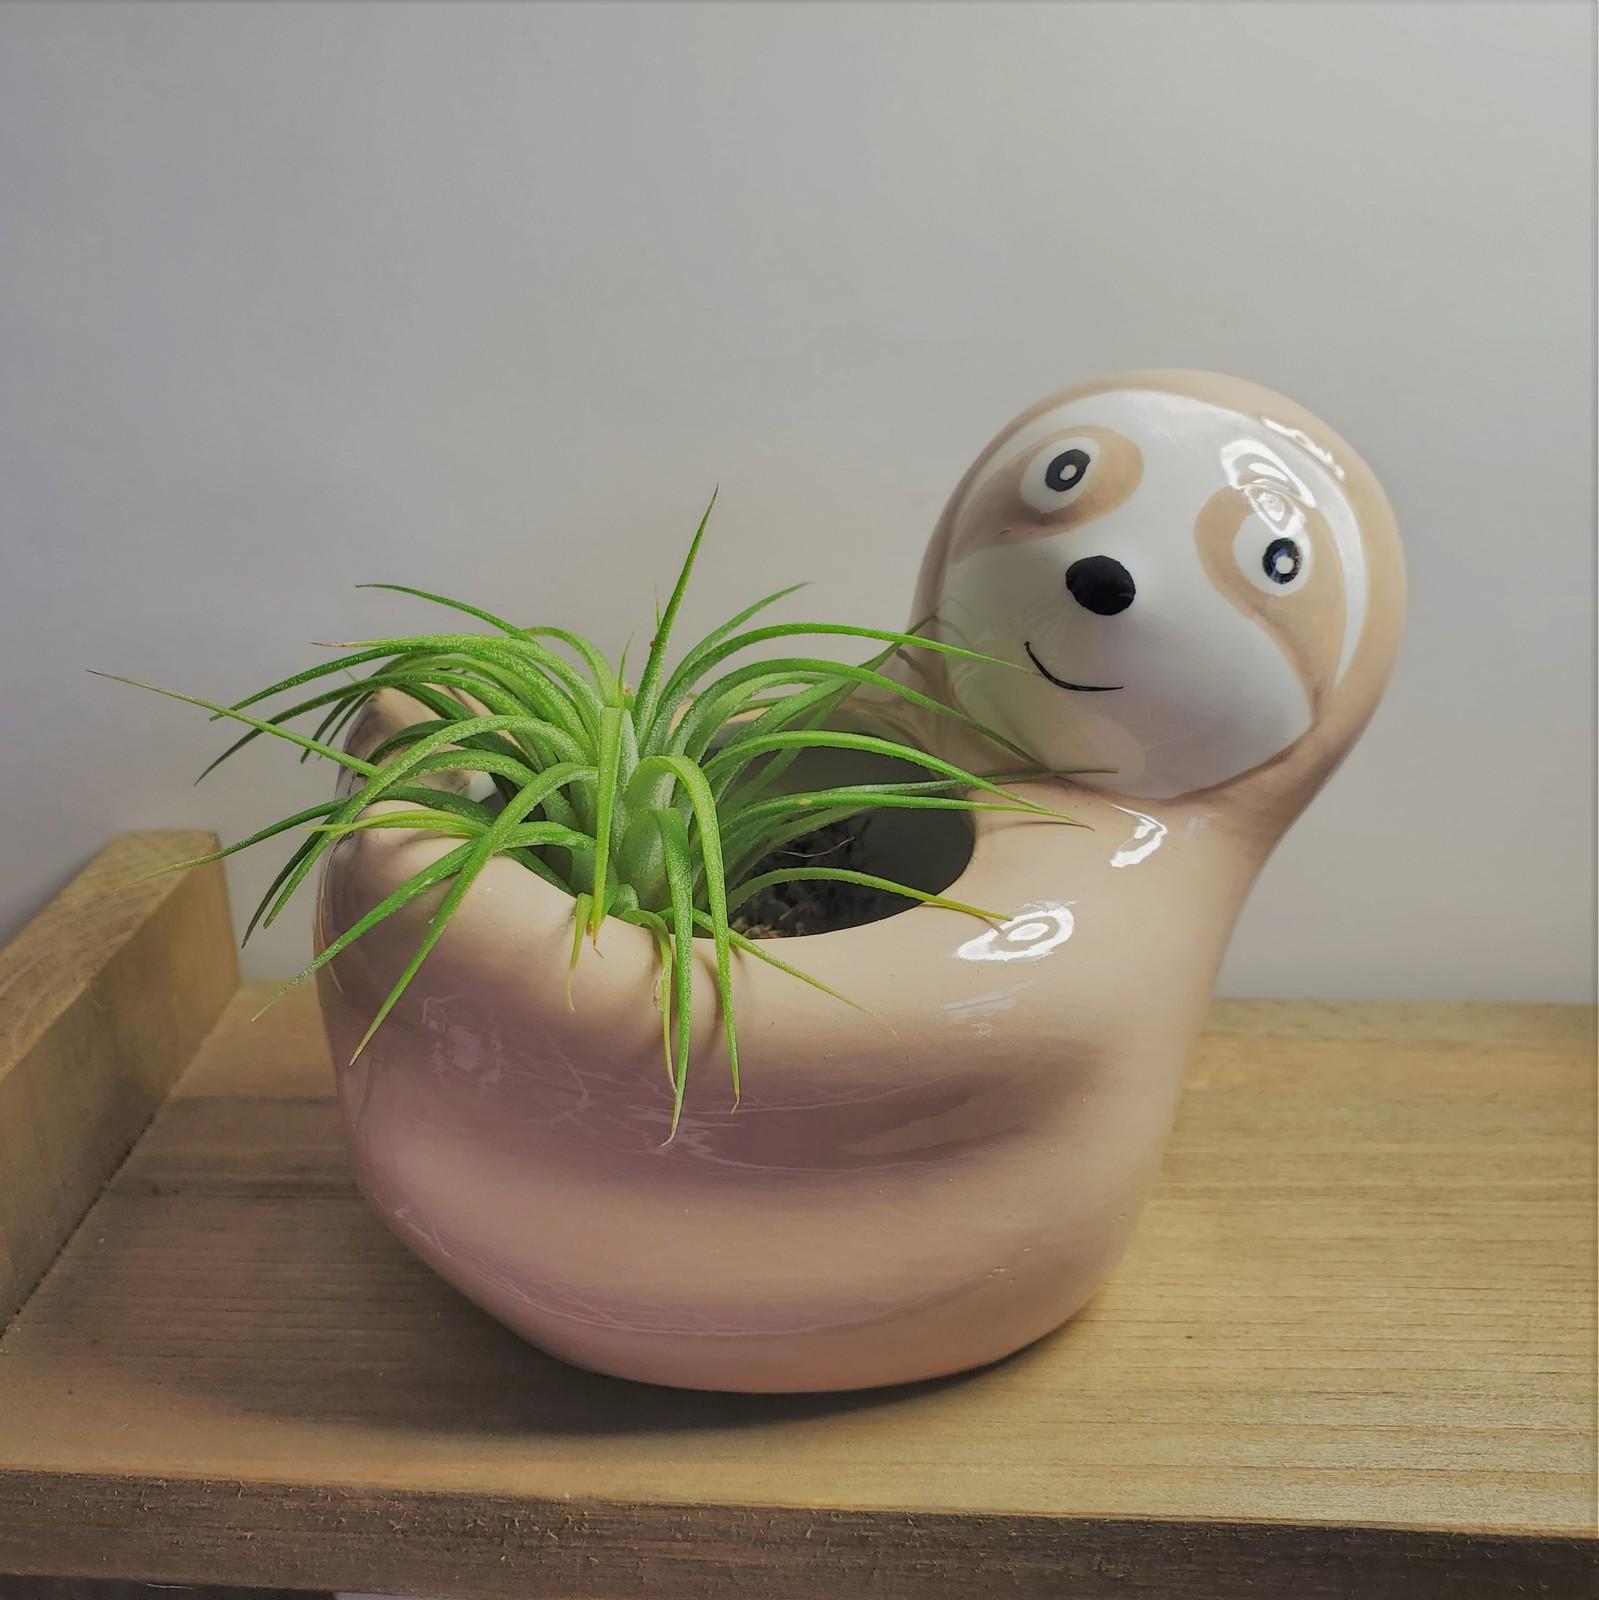 Sloth airplant 1